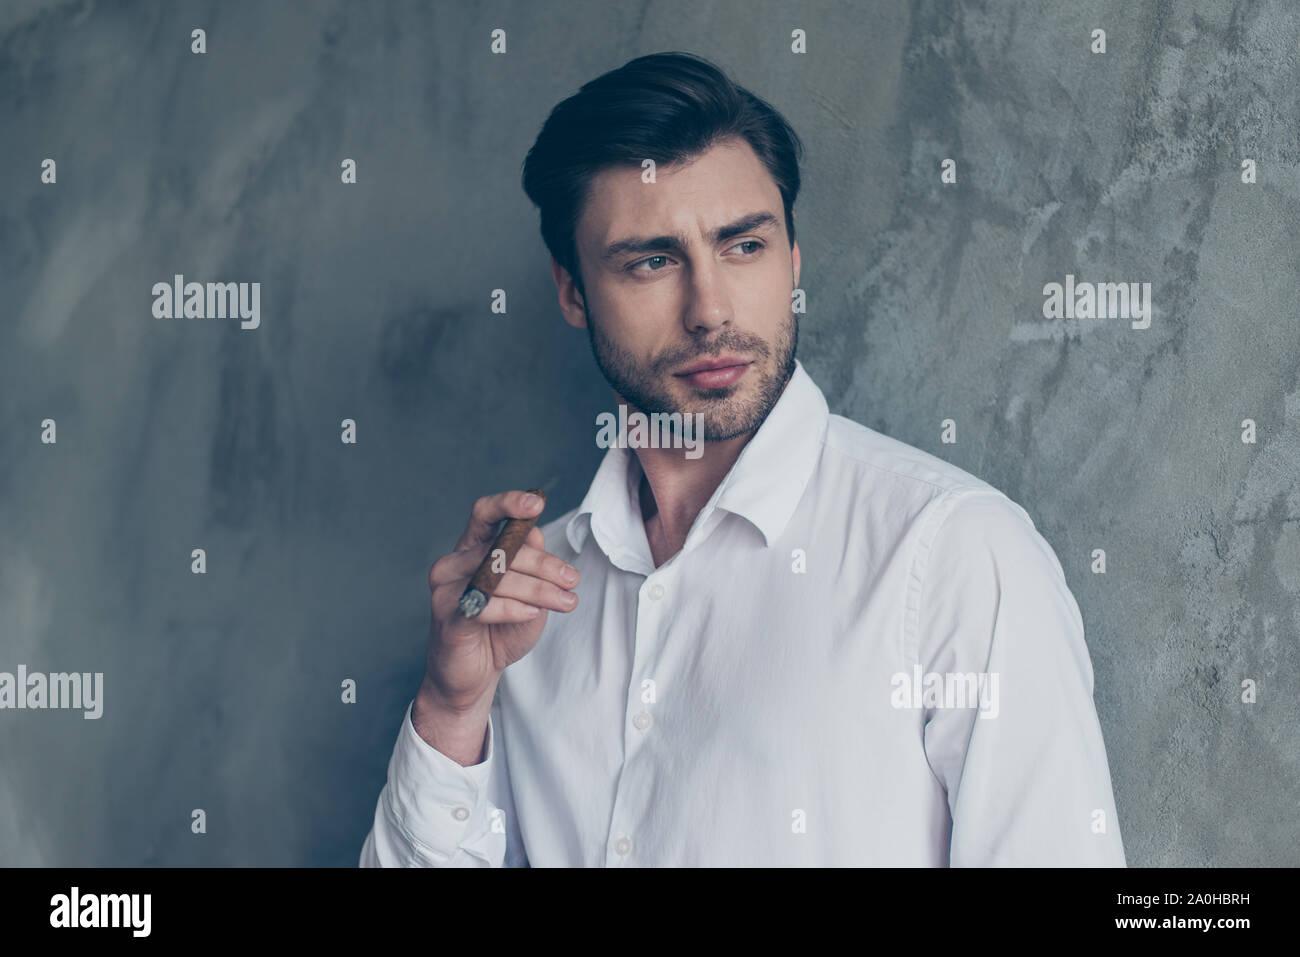 Man good looking Celebrities Who